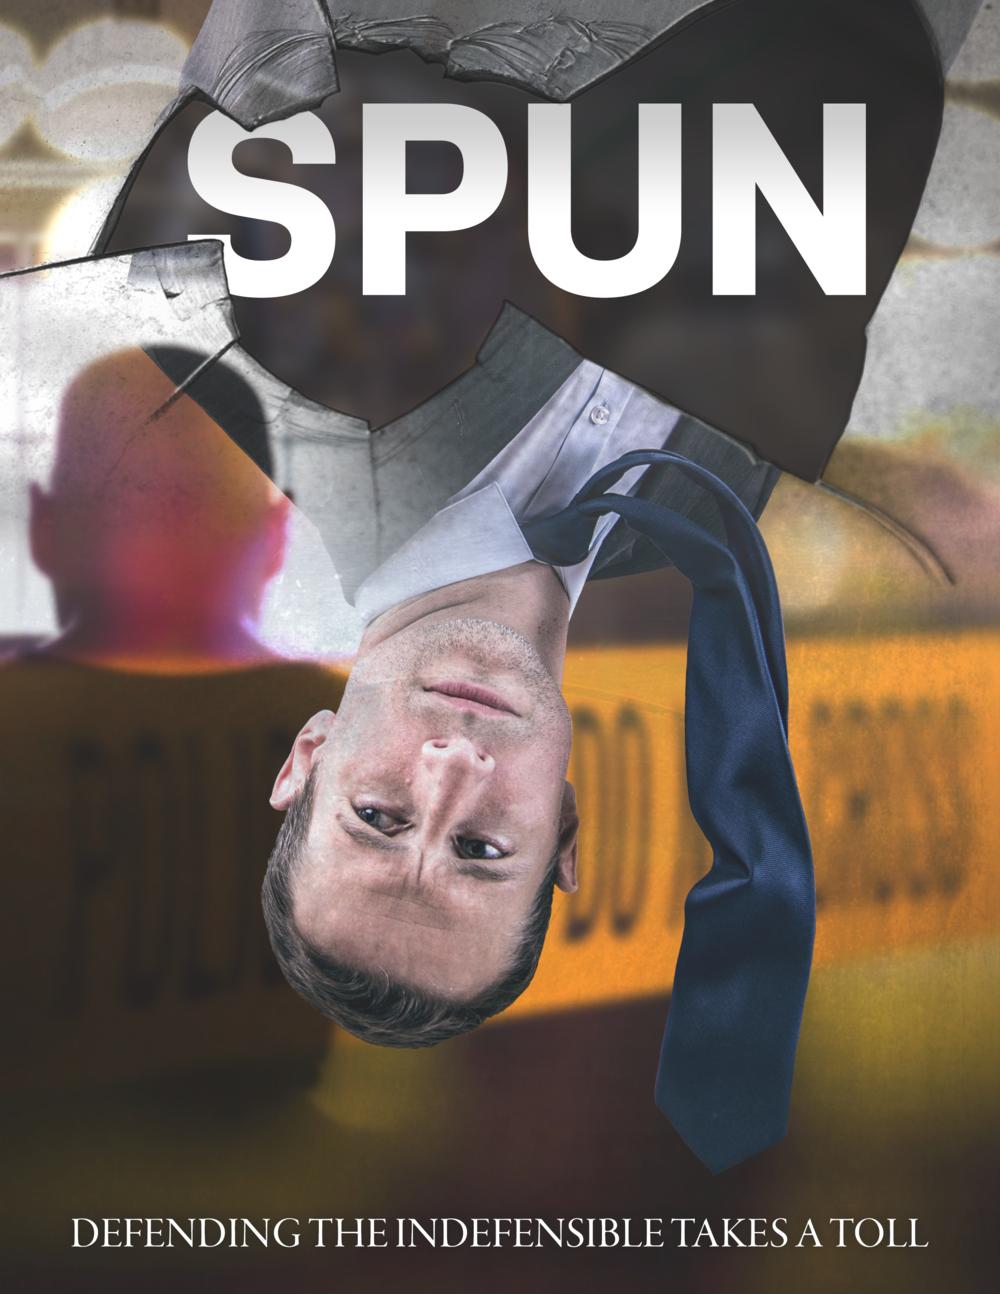 Spun_Prospectus_COVER_Lightened.png